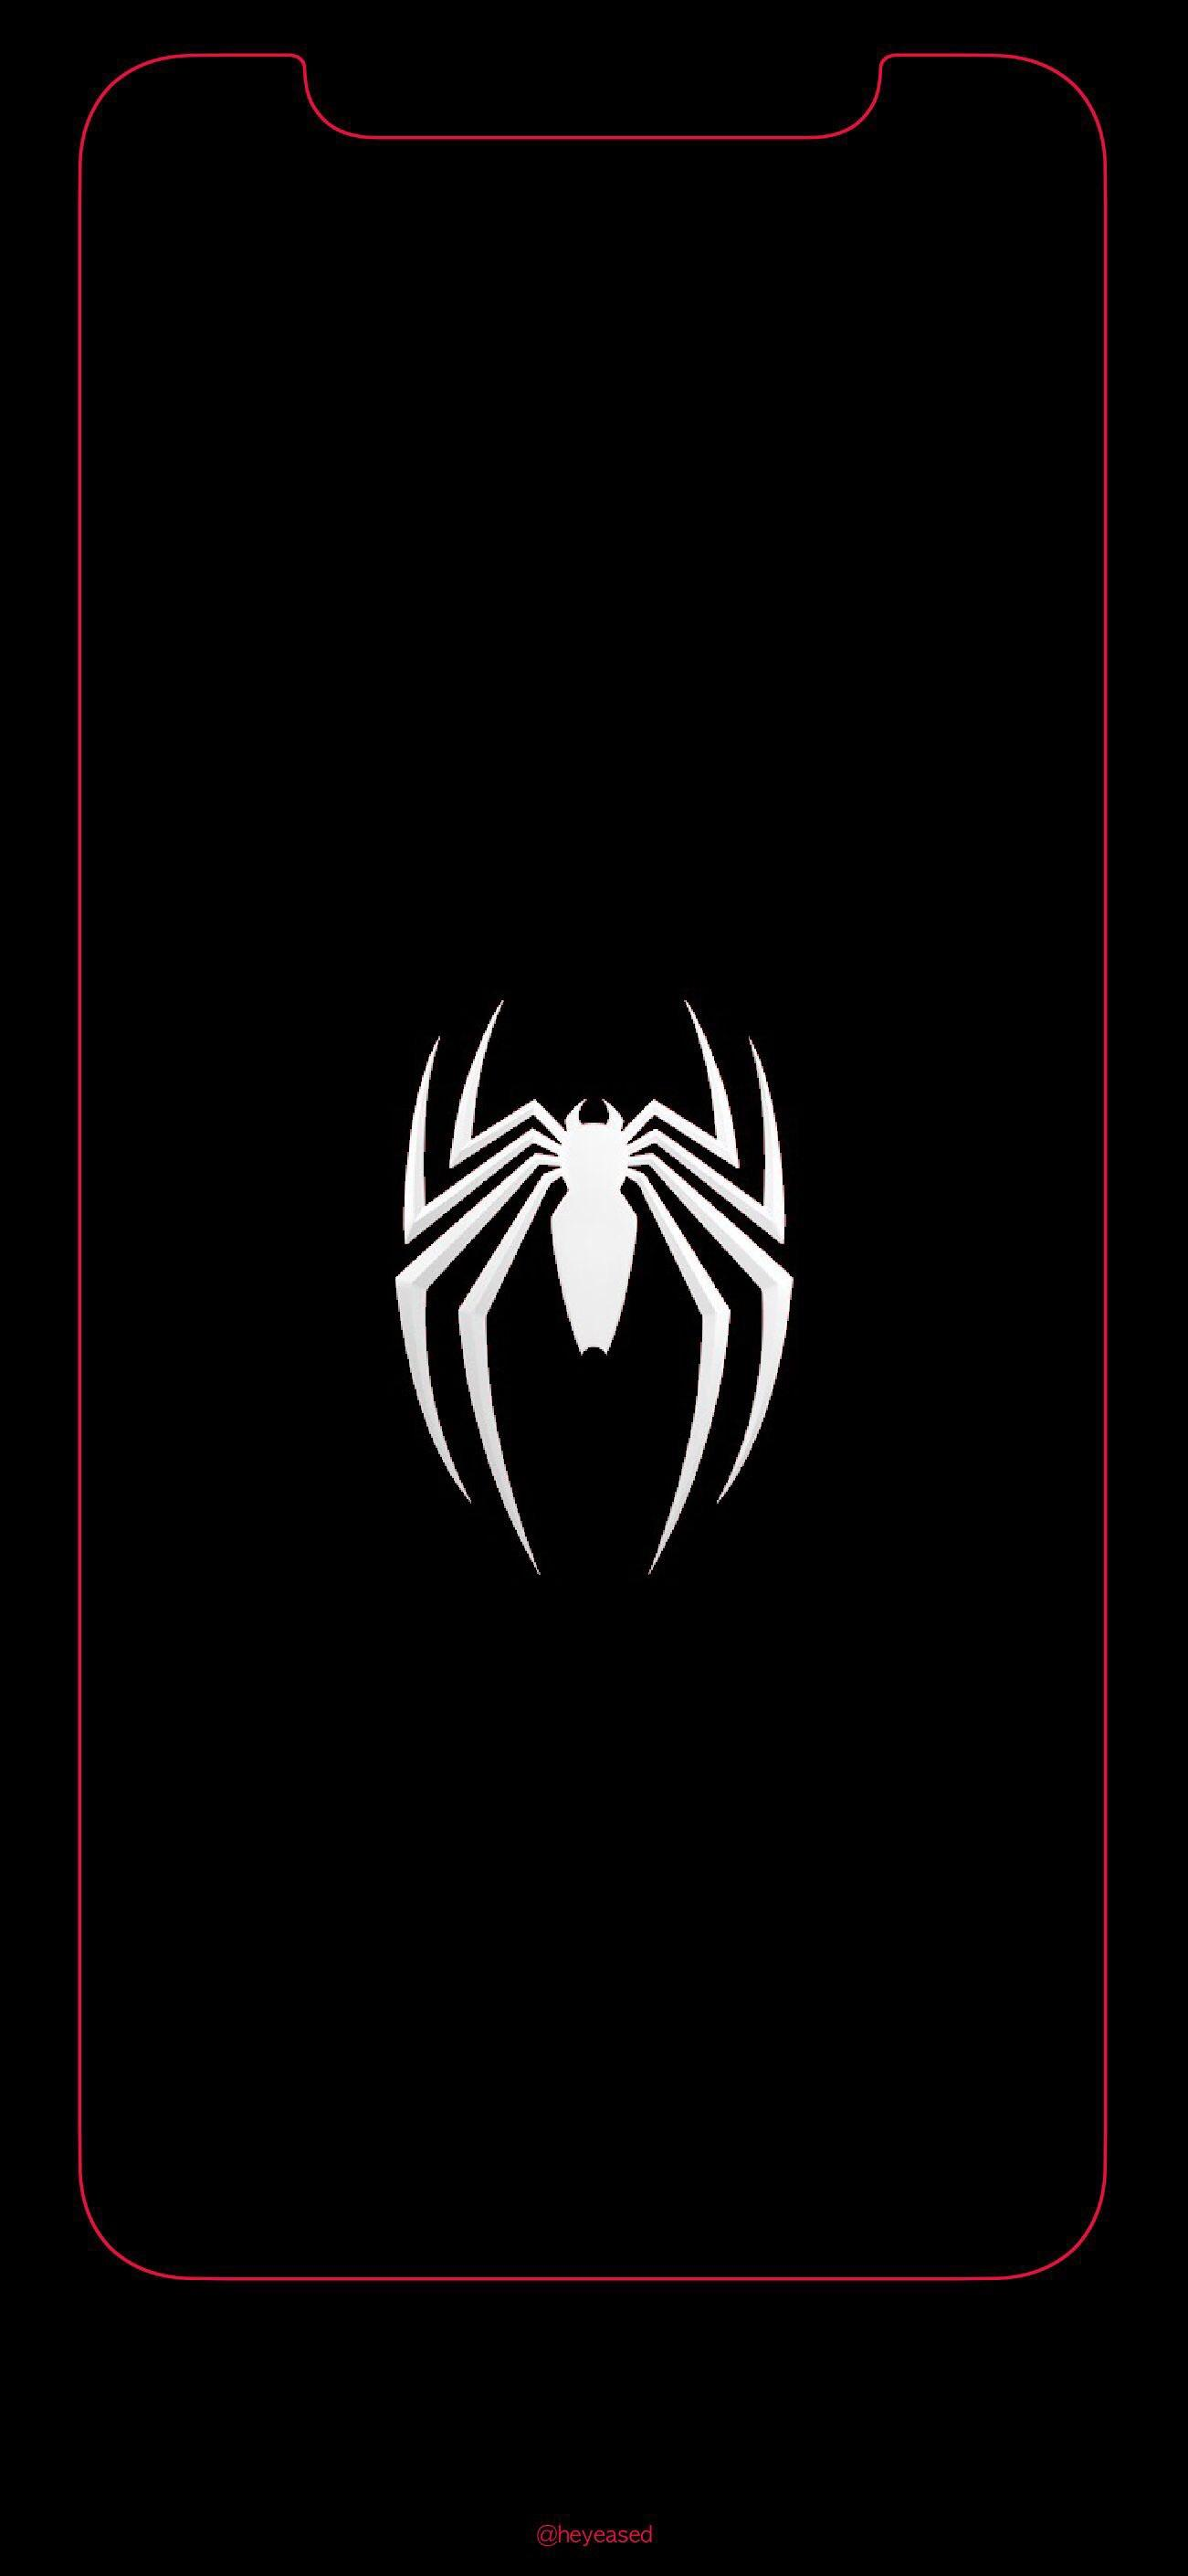 iPhone X Spiderman Logo Wallpaper SpidermanPS4 1301x2820